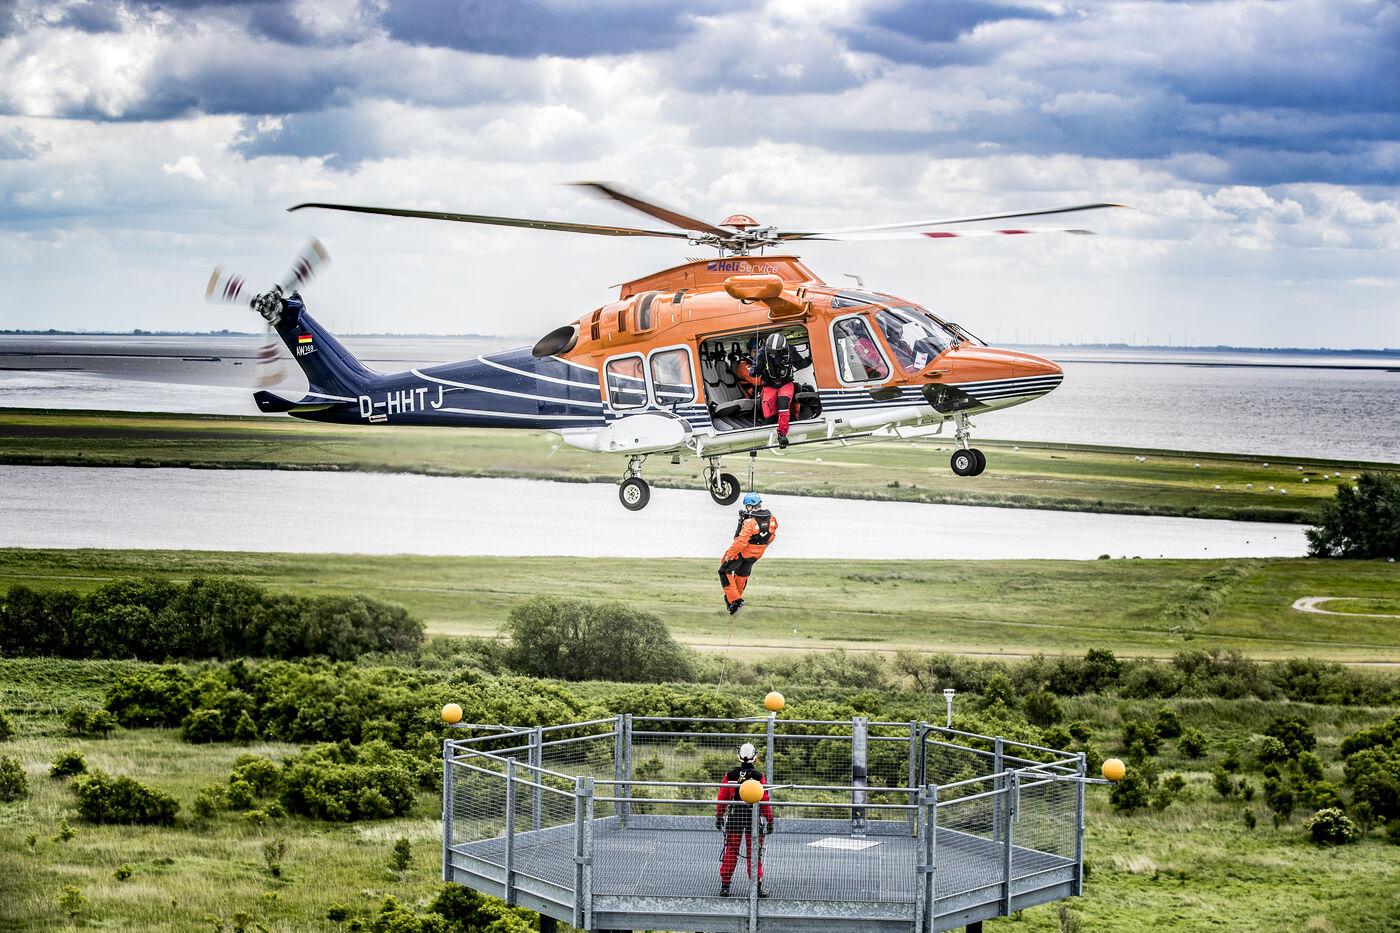 Aviation Safety & Compliance Trainee - Job Emden - Jobs at Heli Service International GmbH